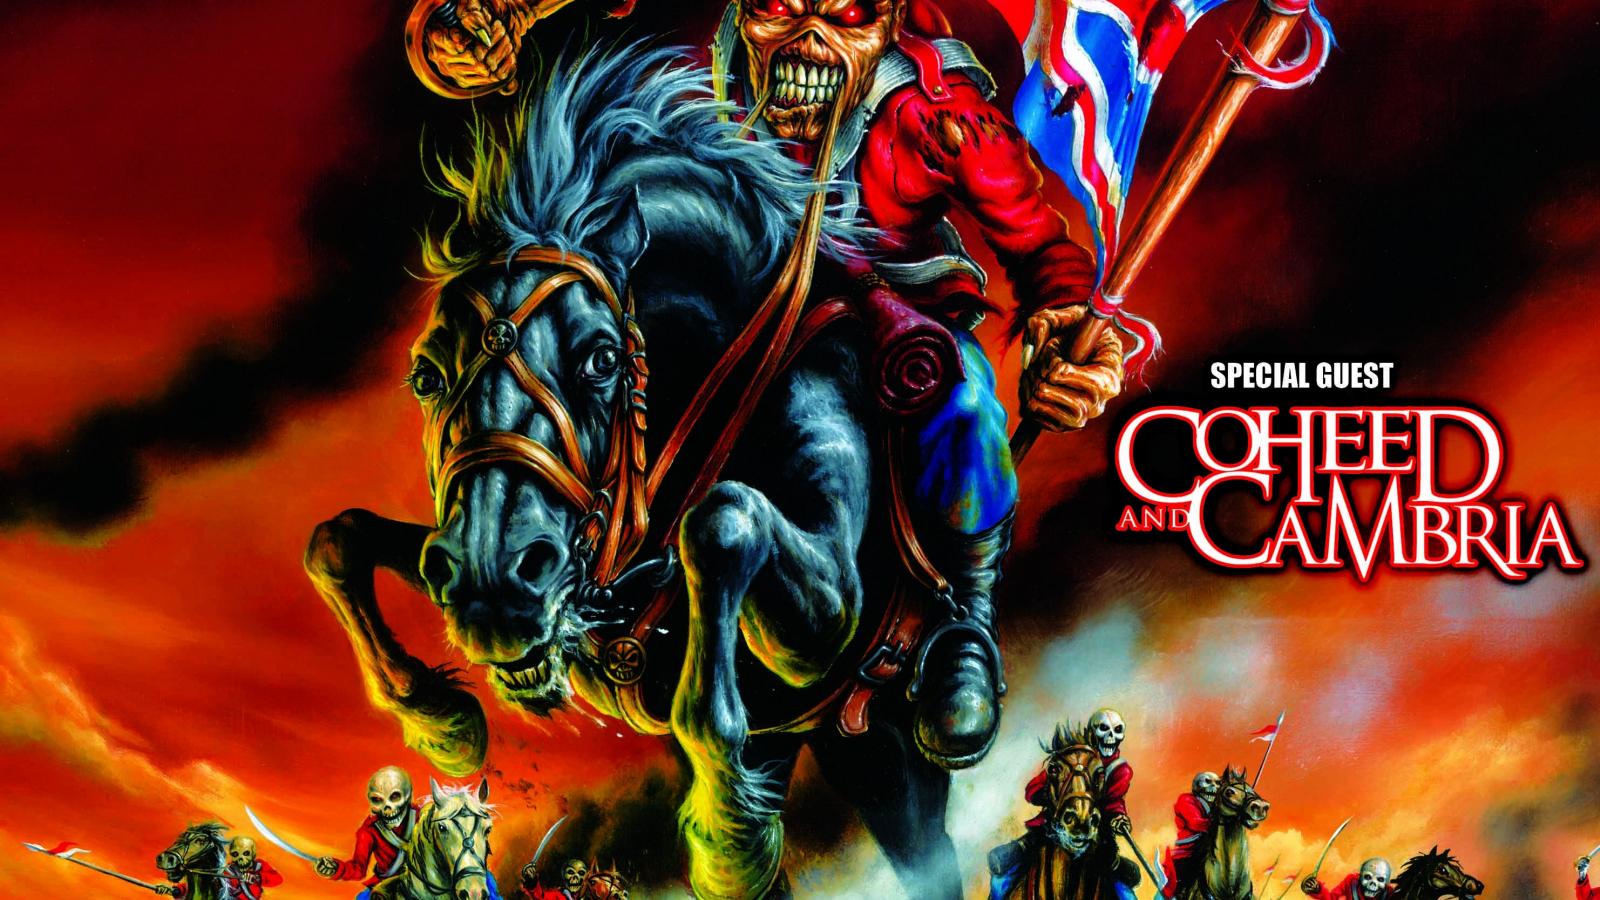 Free Download Iron Maiden Computer Wallpapers Desktop Backgrounds